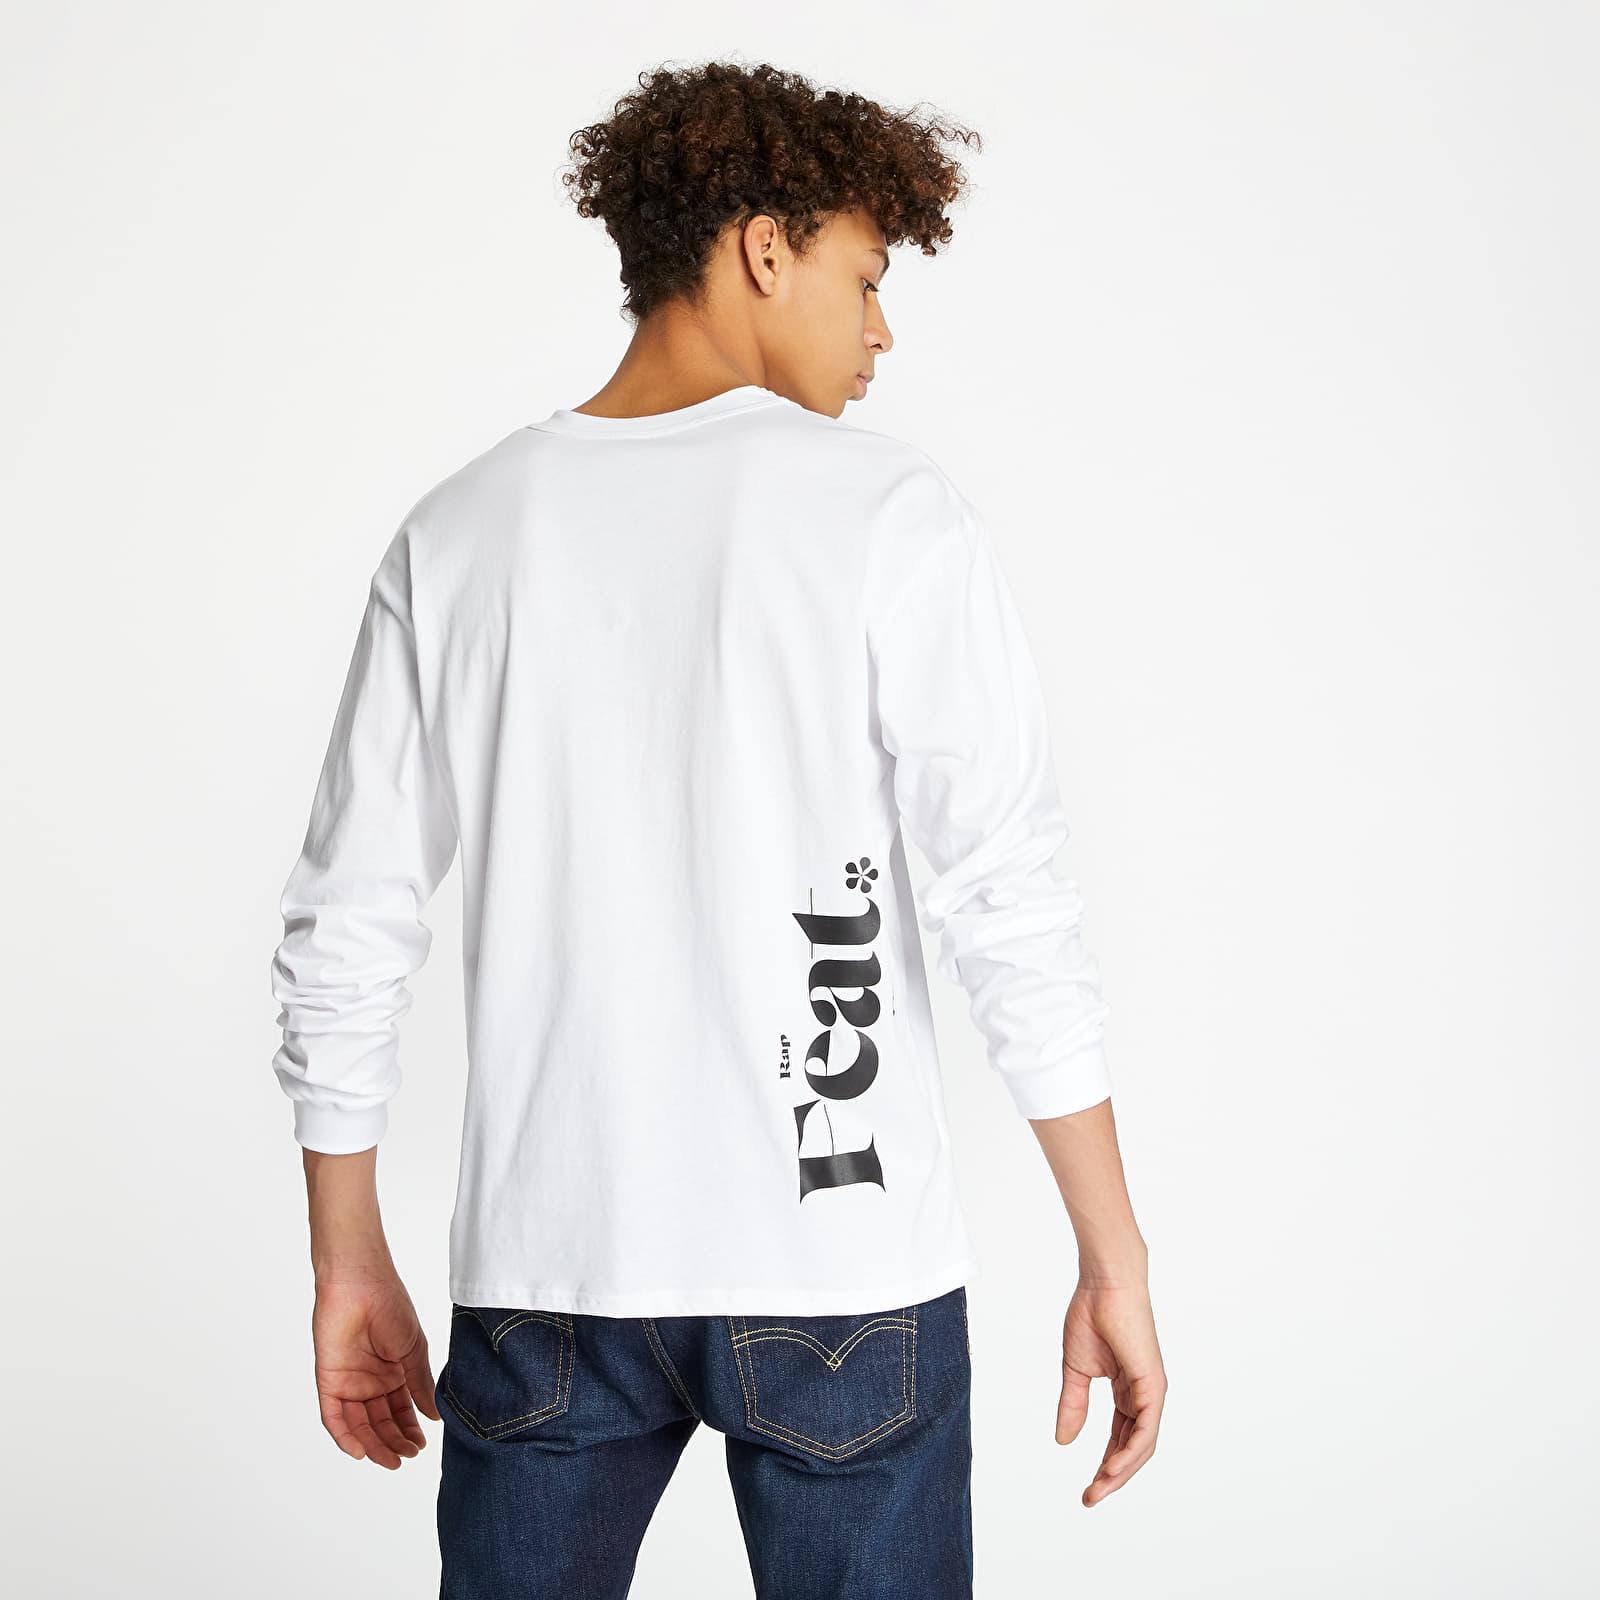 T-shirts RAP x Footshop Definition Longsleeve White